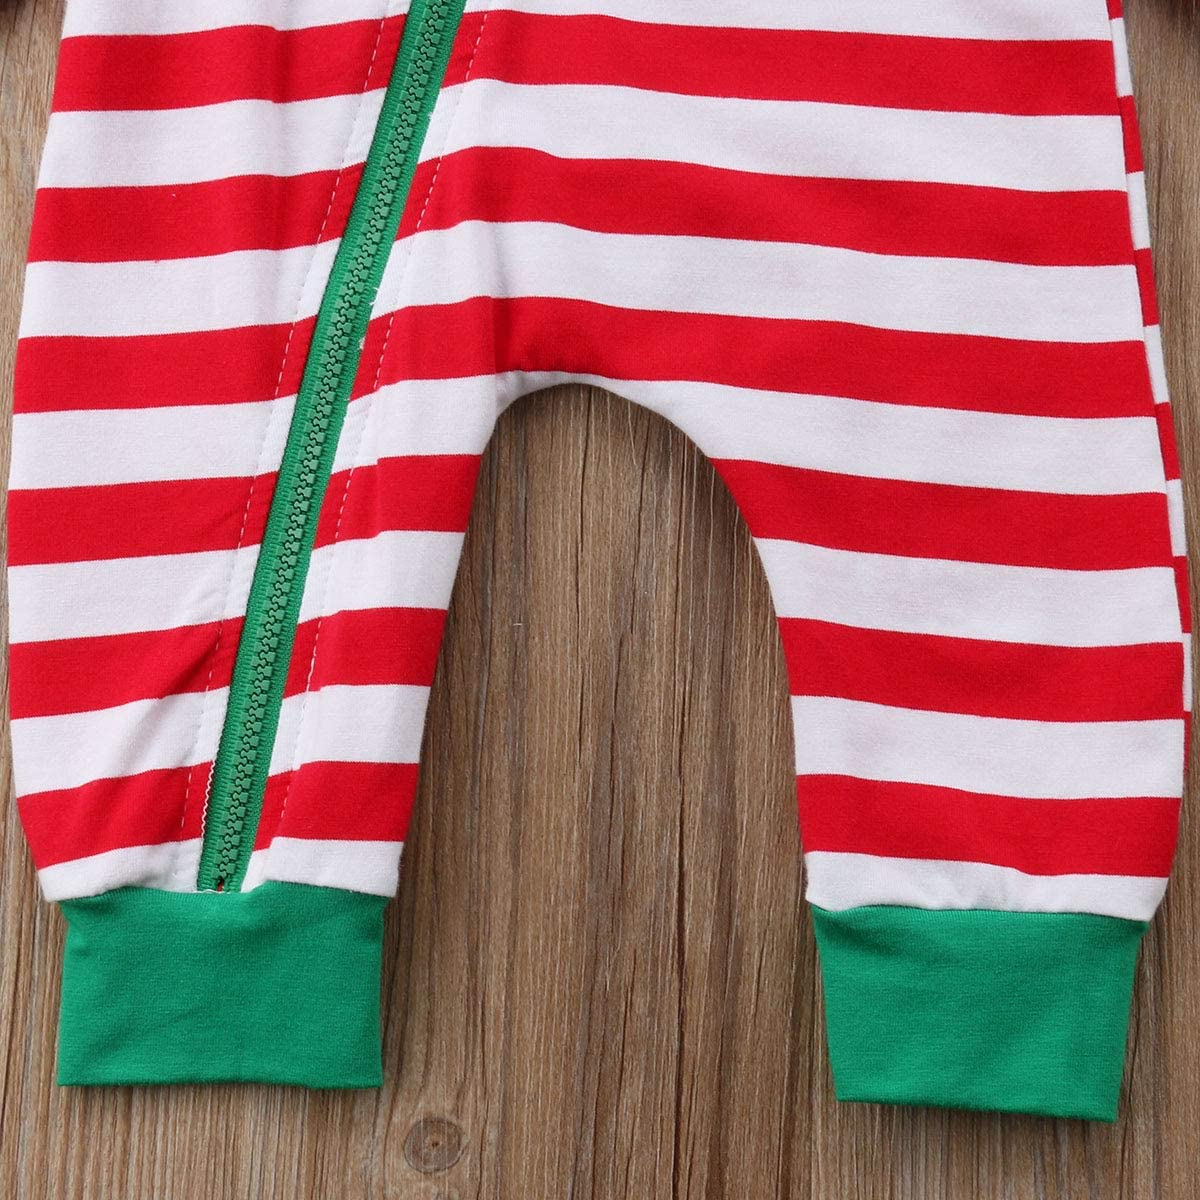 Mubineo Baby Girl Boy Christmas Elf Stripe Long Sleeve One Piece Romper Bodysuit Outfit